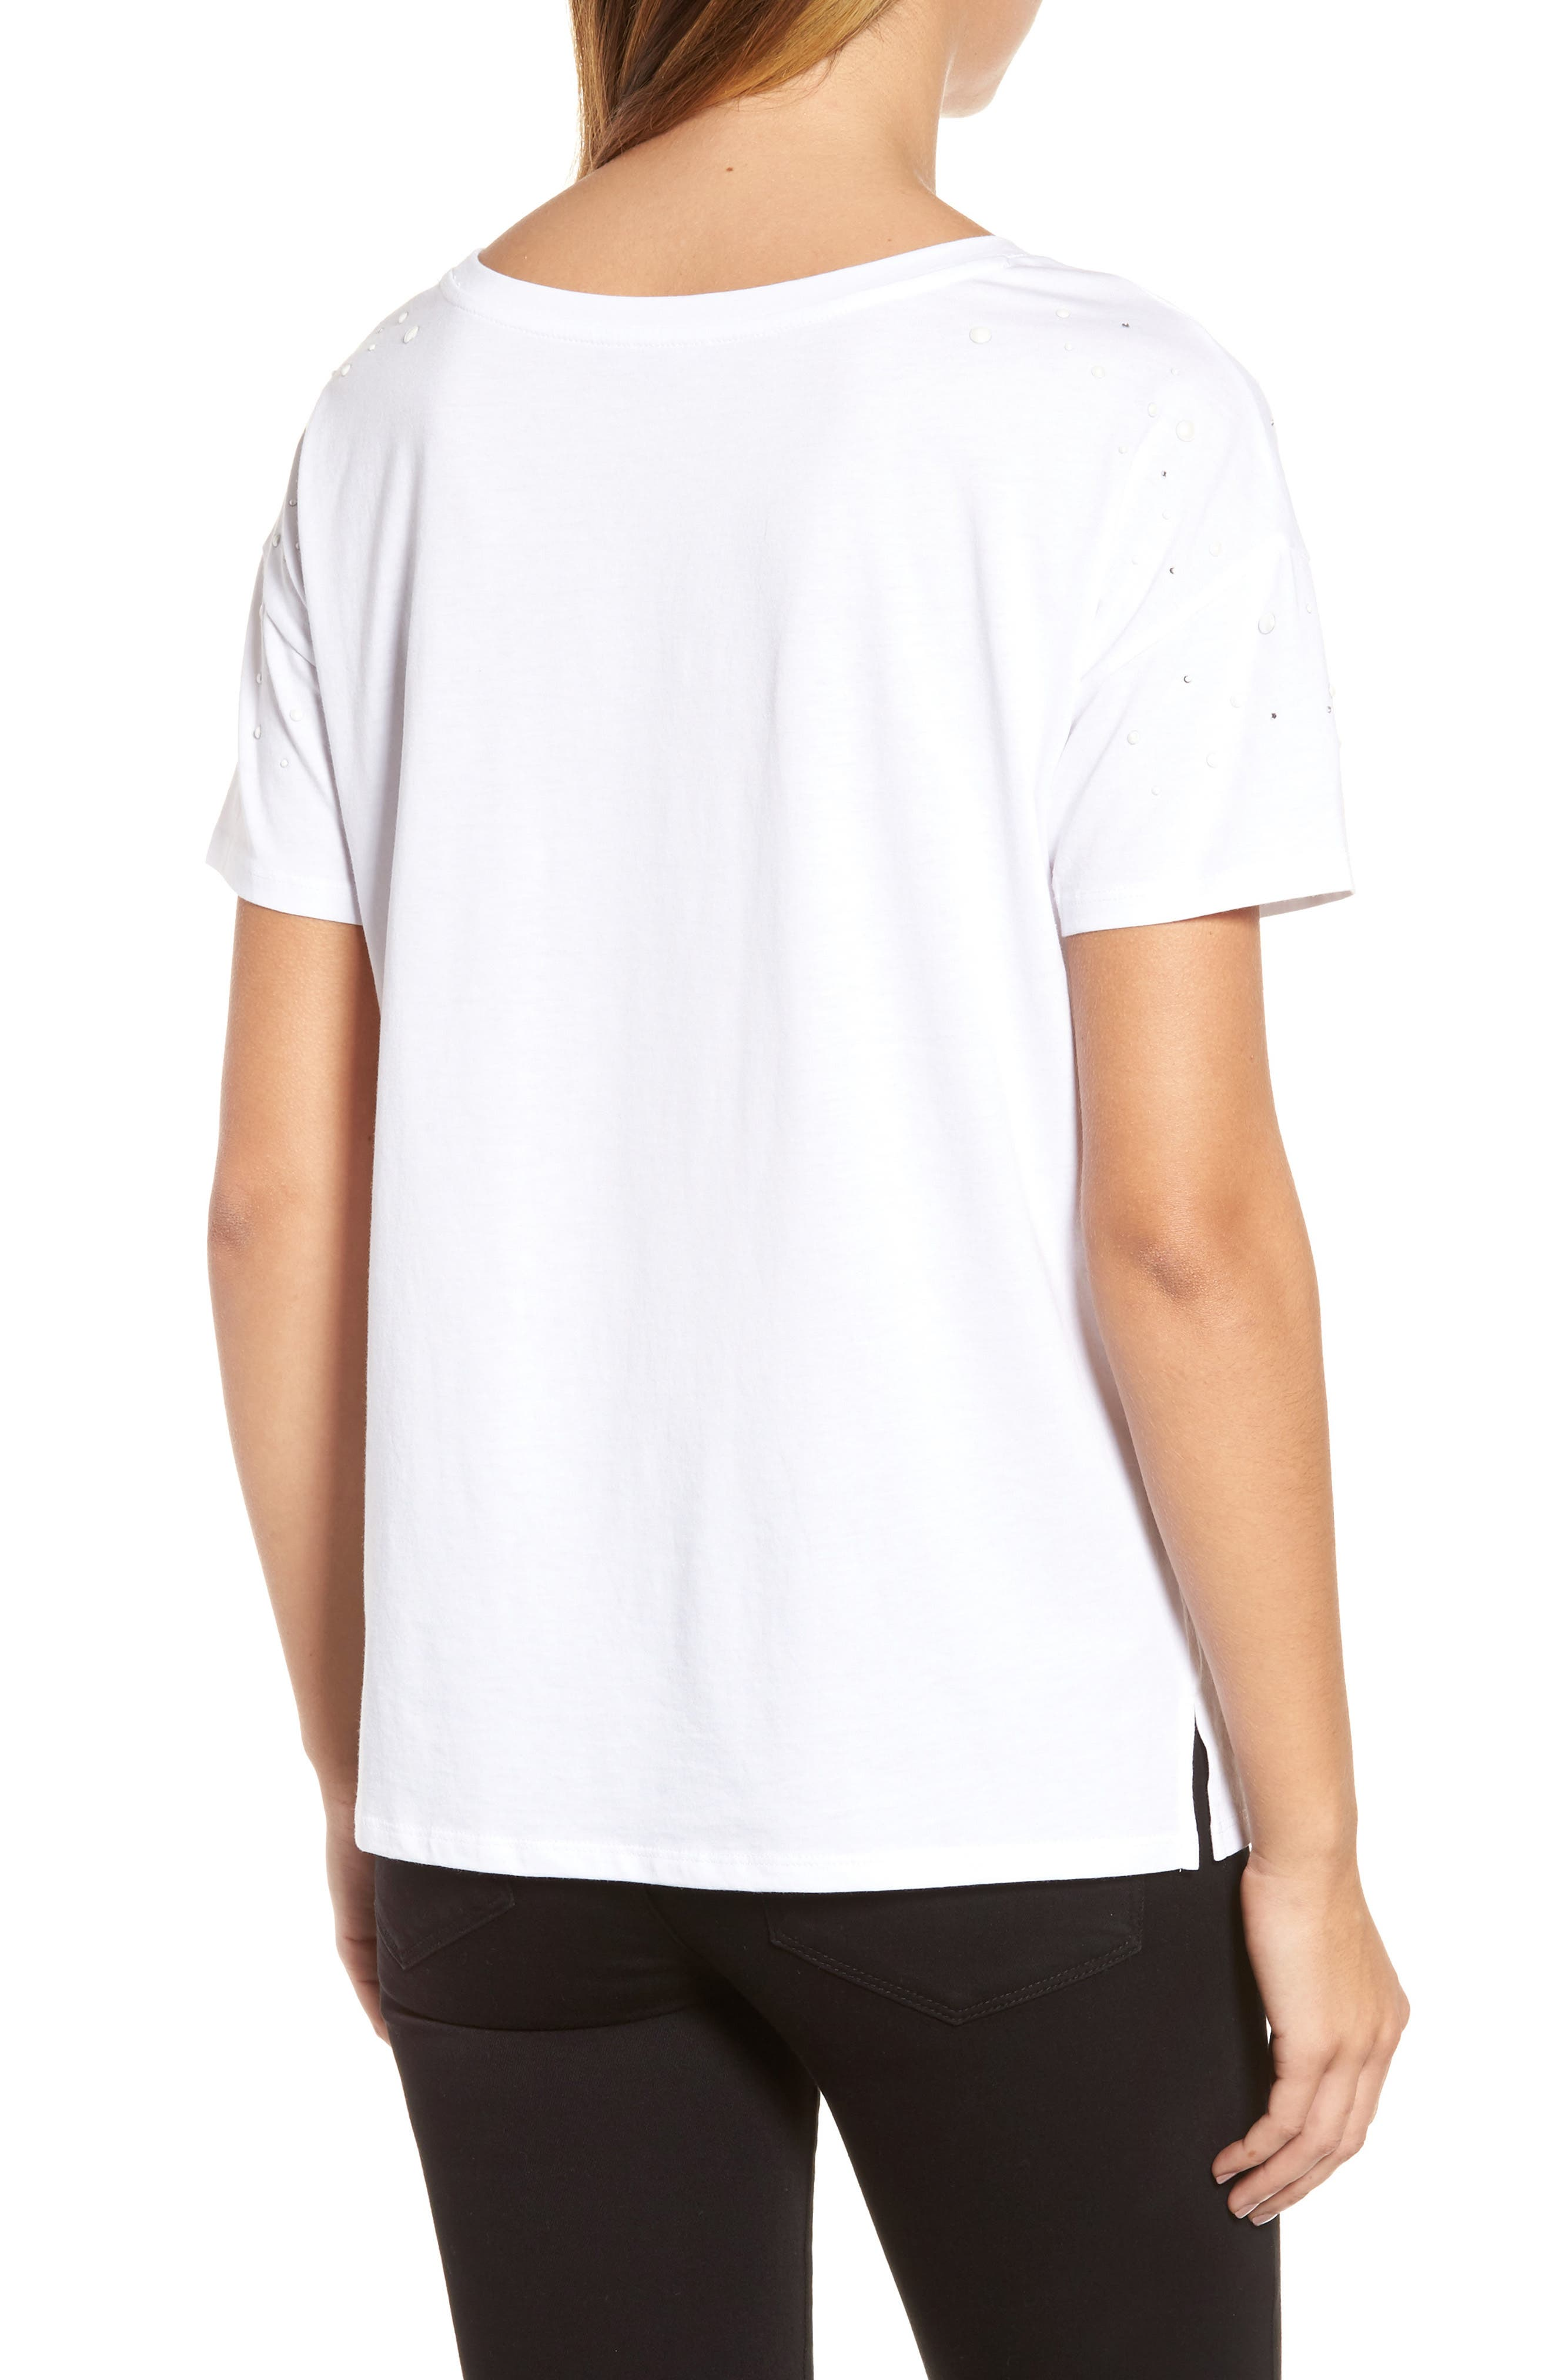 Alternate Image 2  - NYDJ Short Sleeve Pearly T-Shirt